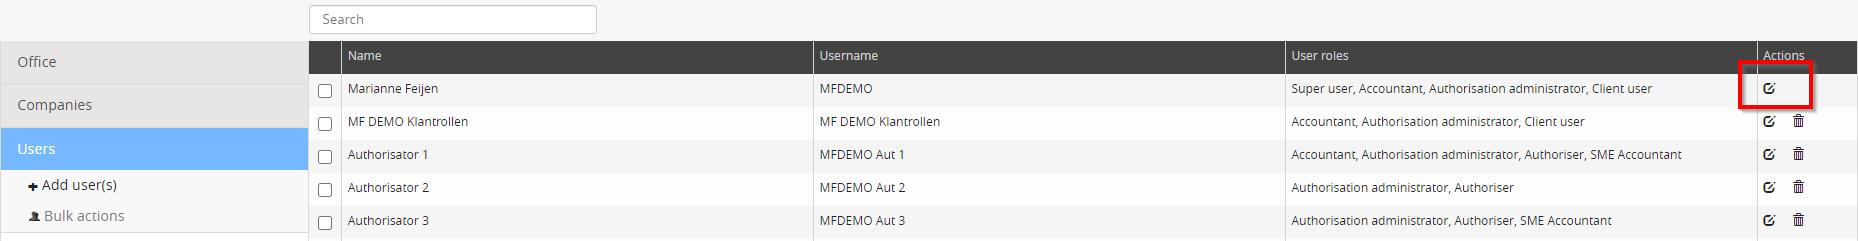 User settings in Basecone